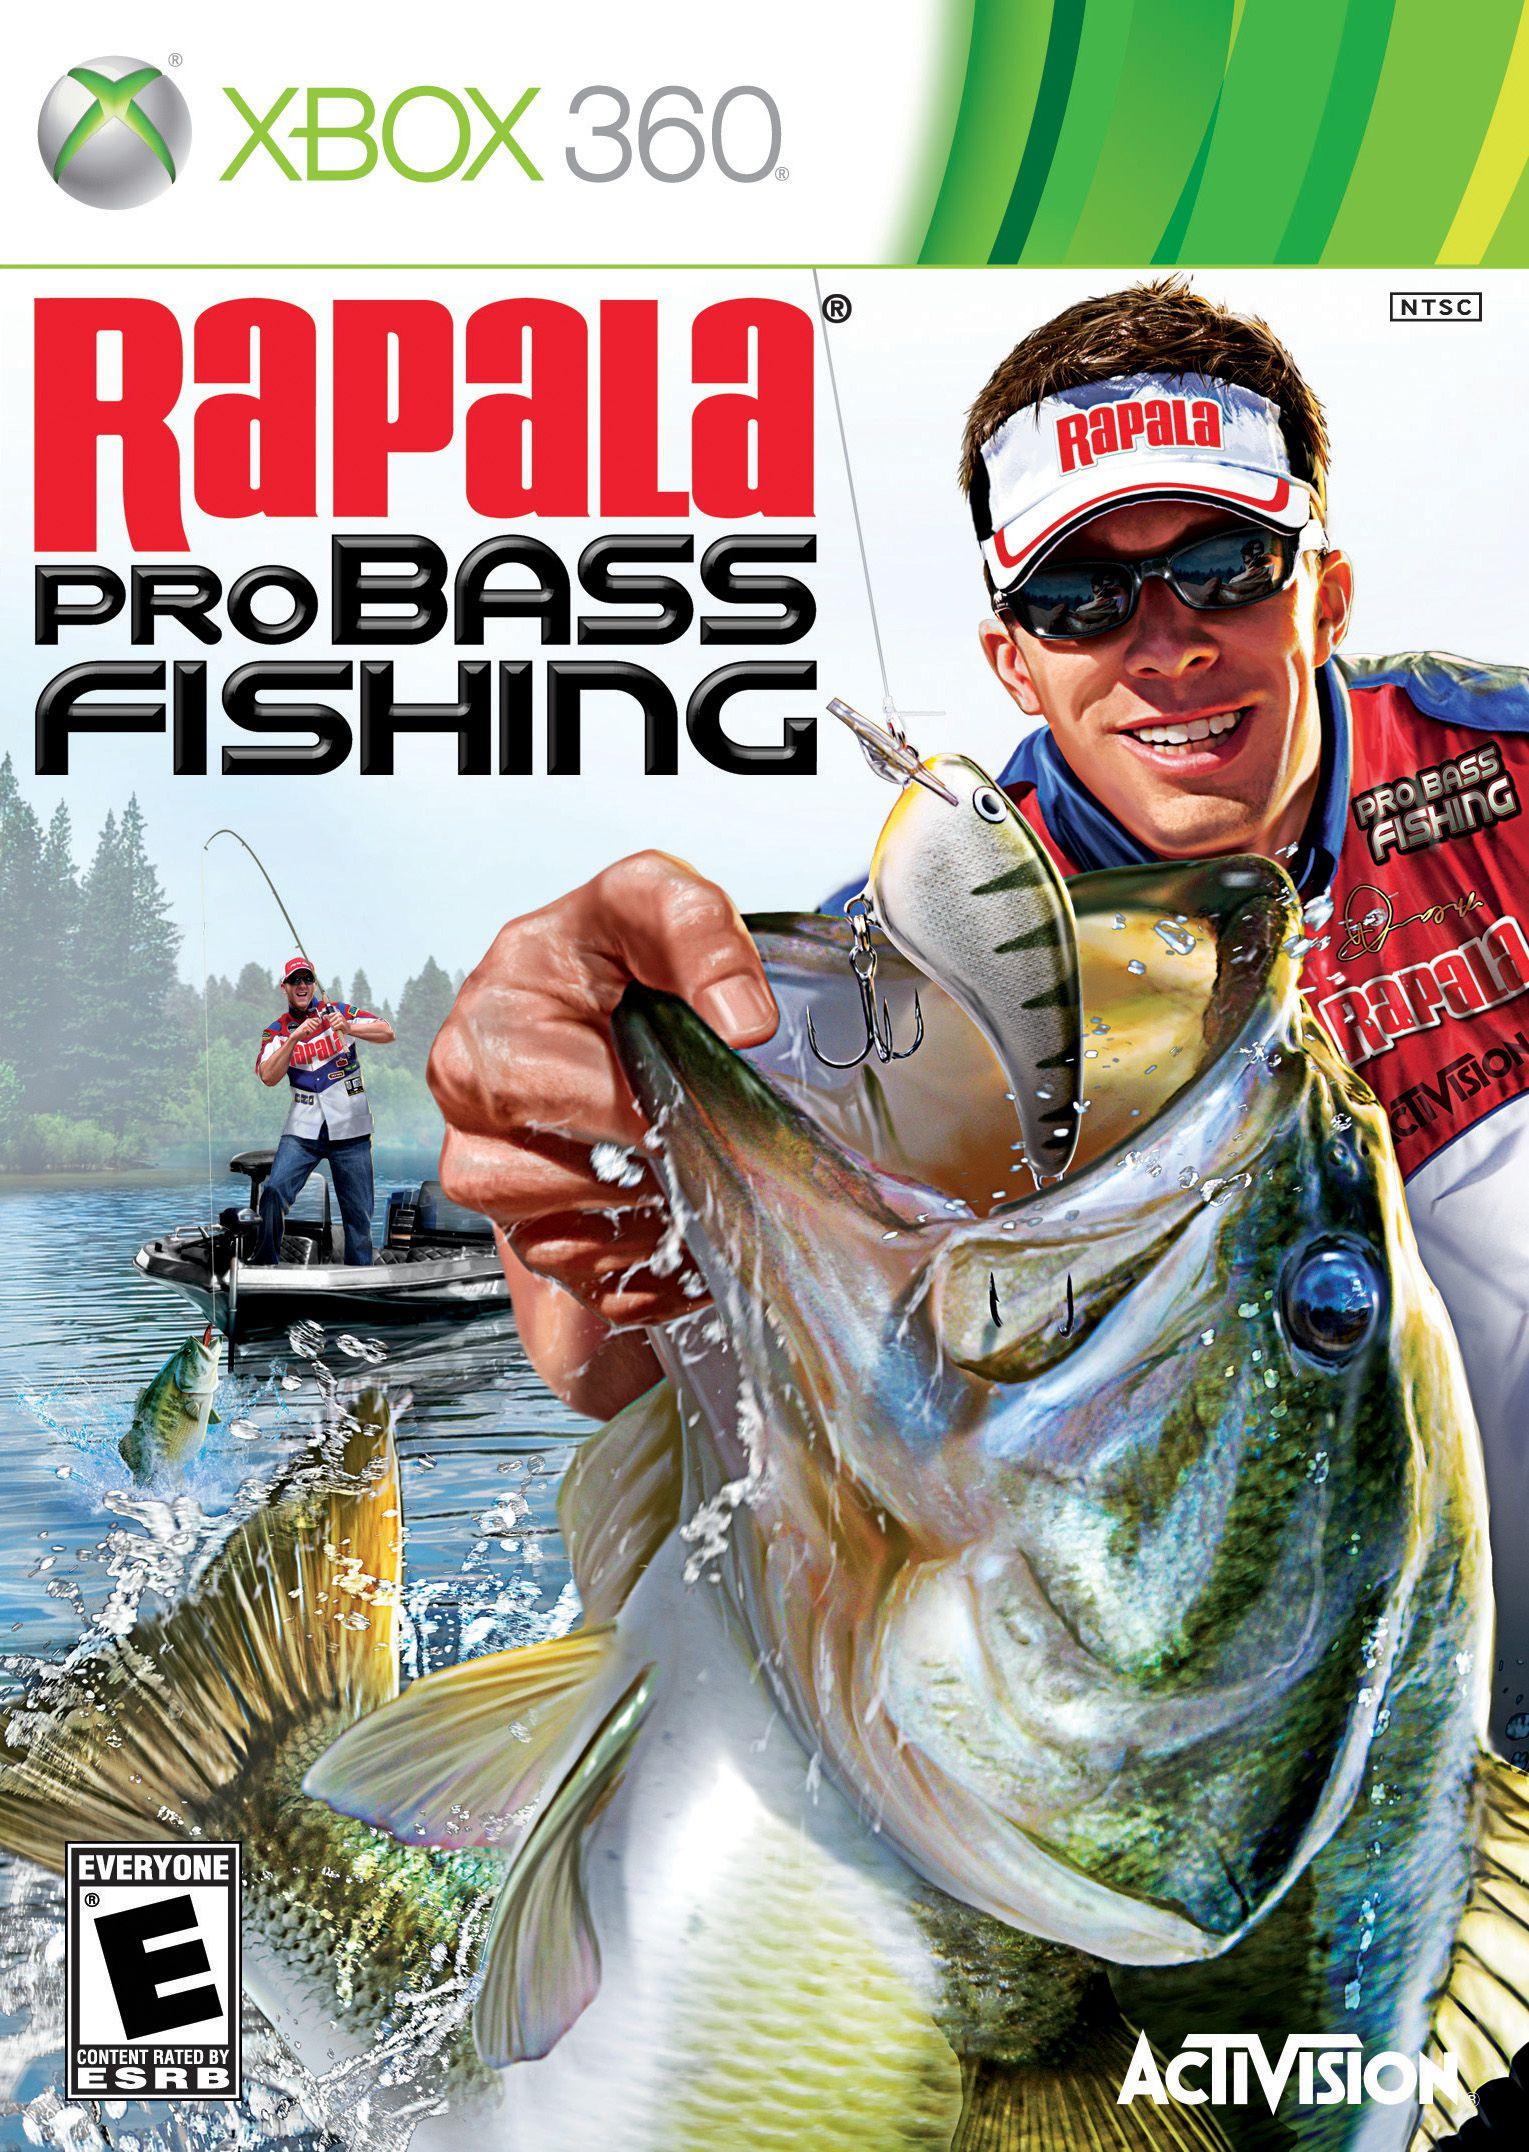 Rapala pro bass fishing game review xbox 360 for Rapala fishing frenzy 2009